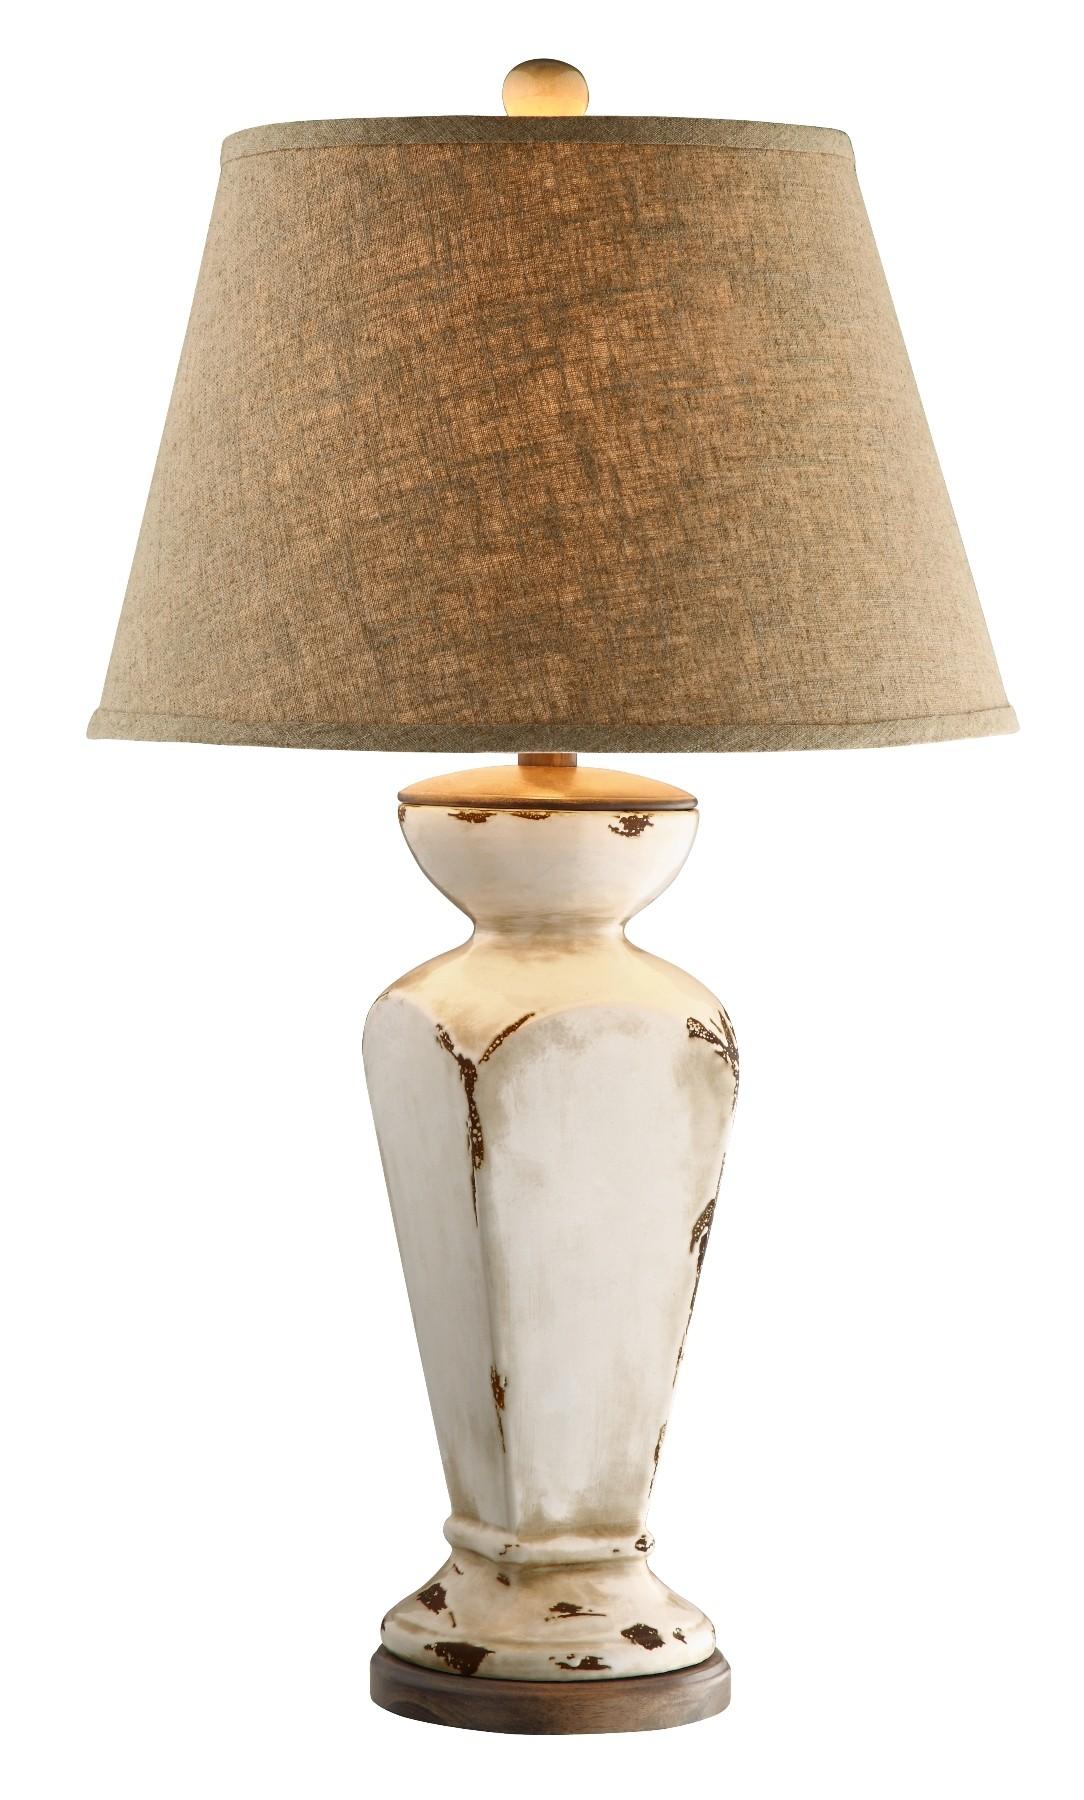 Aged Cream Ceramic Table Lamp from Steinworld (90032 ...